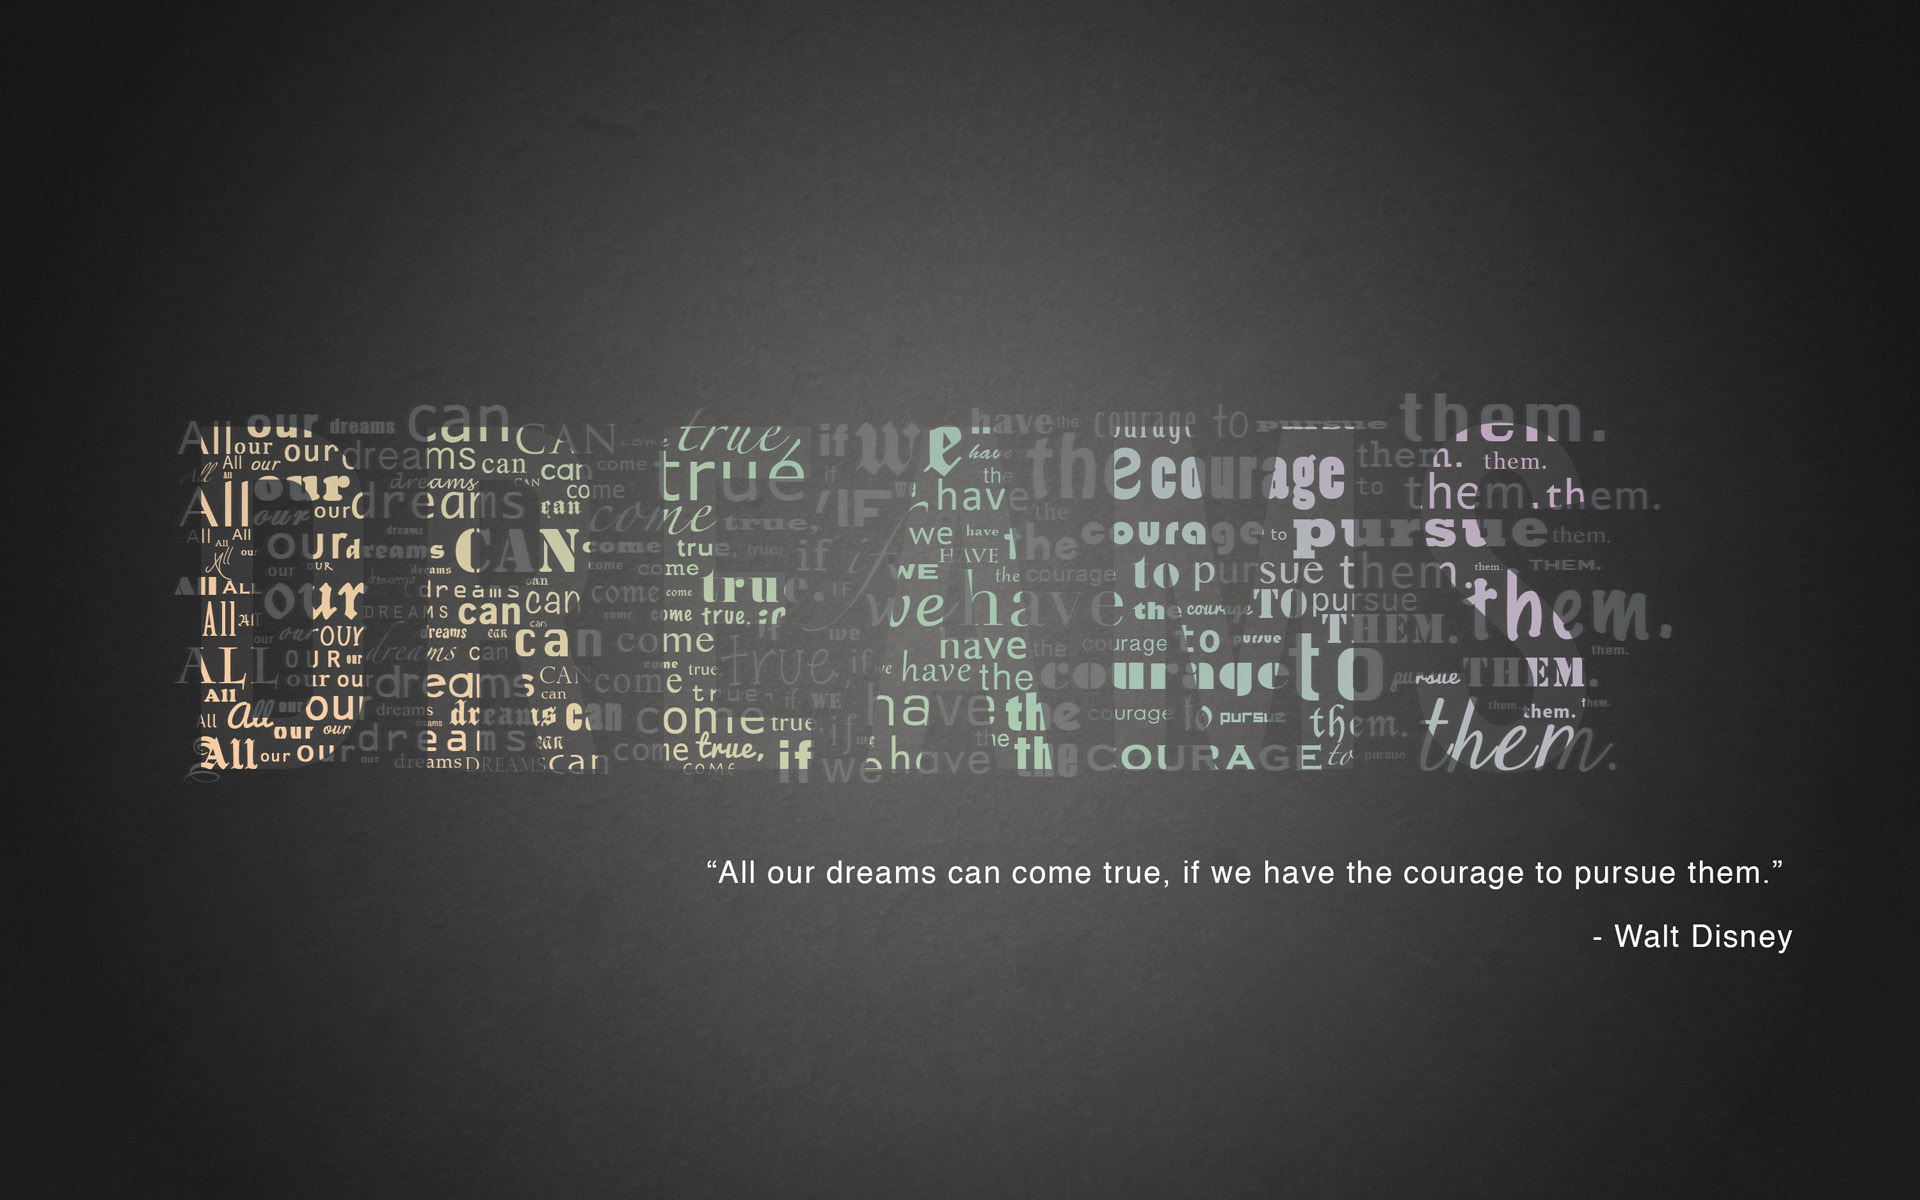 Cute Quotes Hd Wallpaper QuotesGram 1920x1200